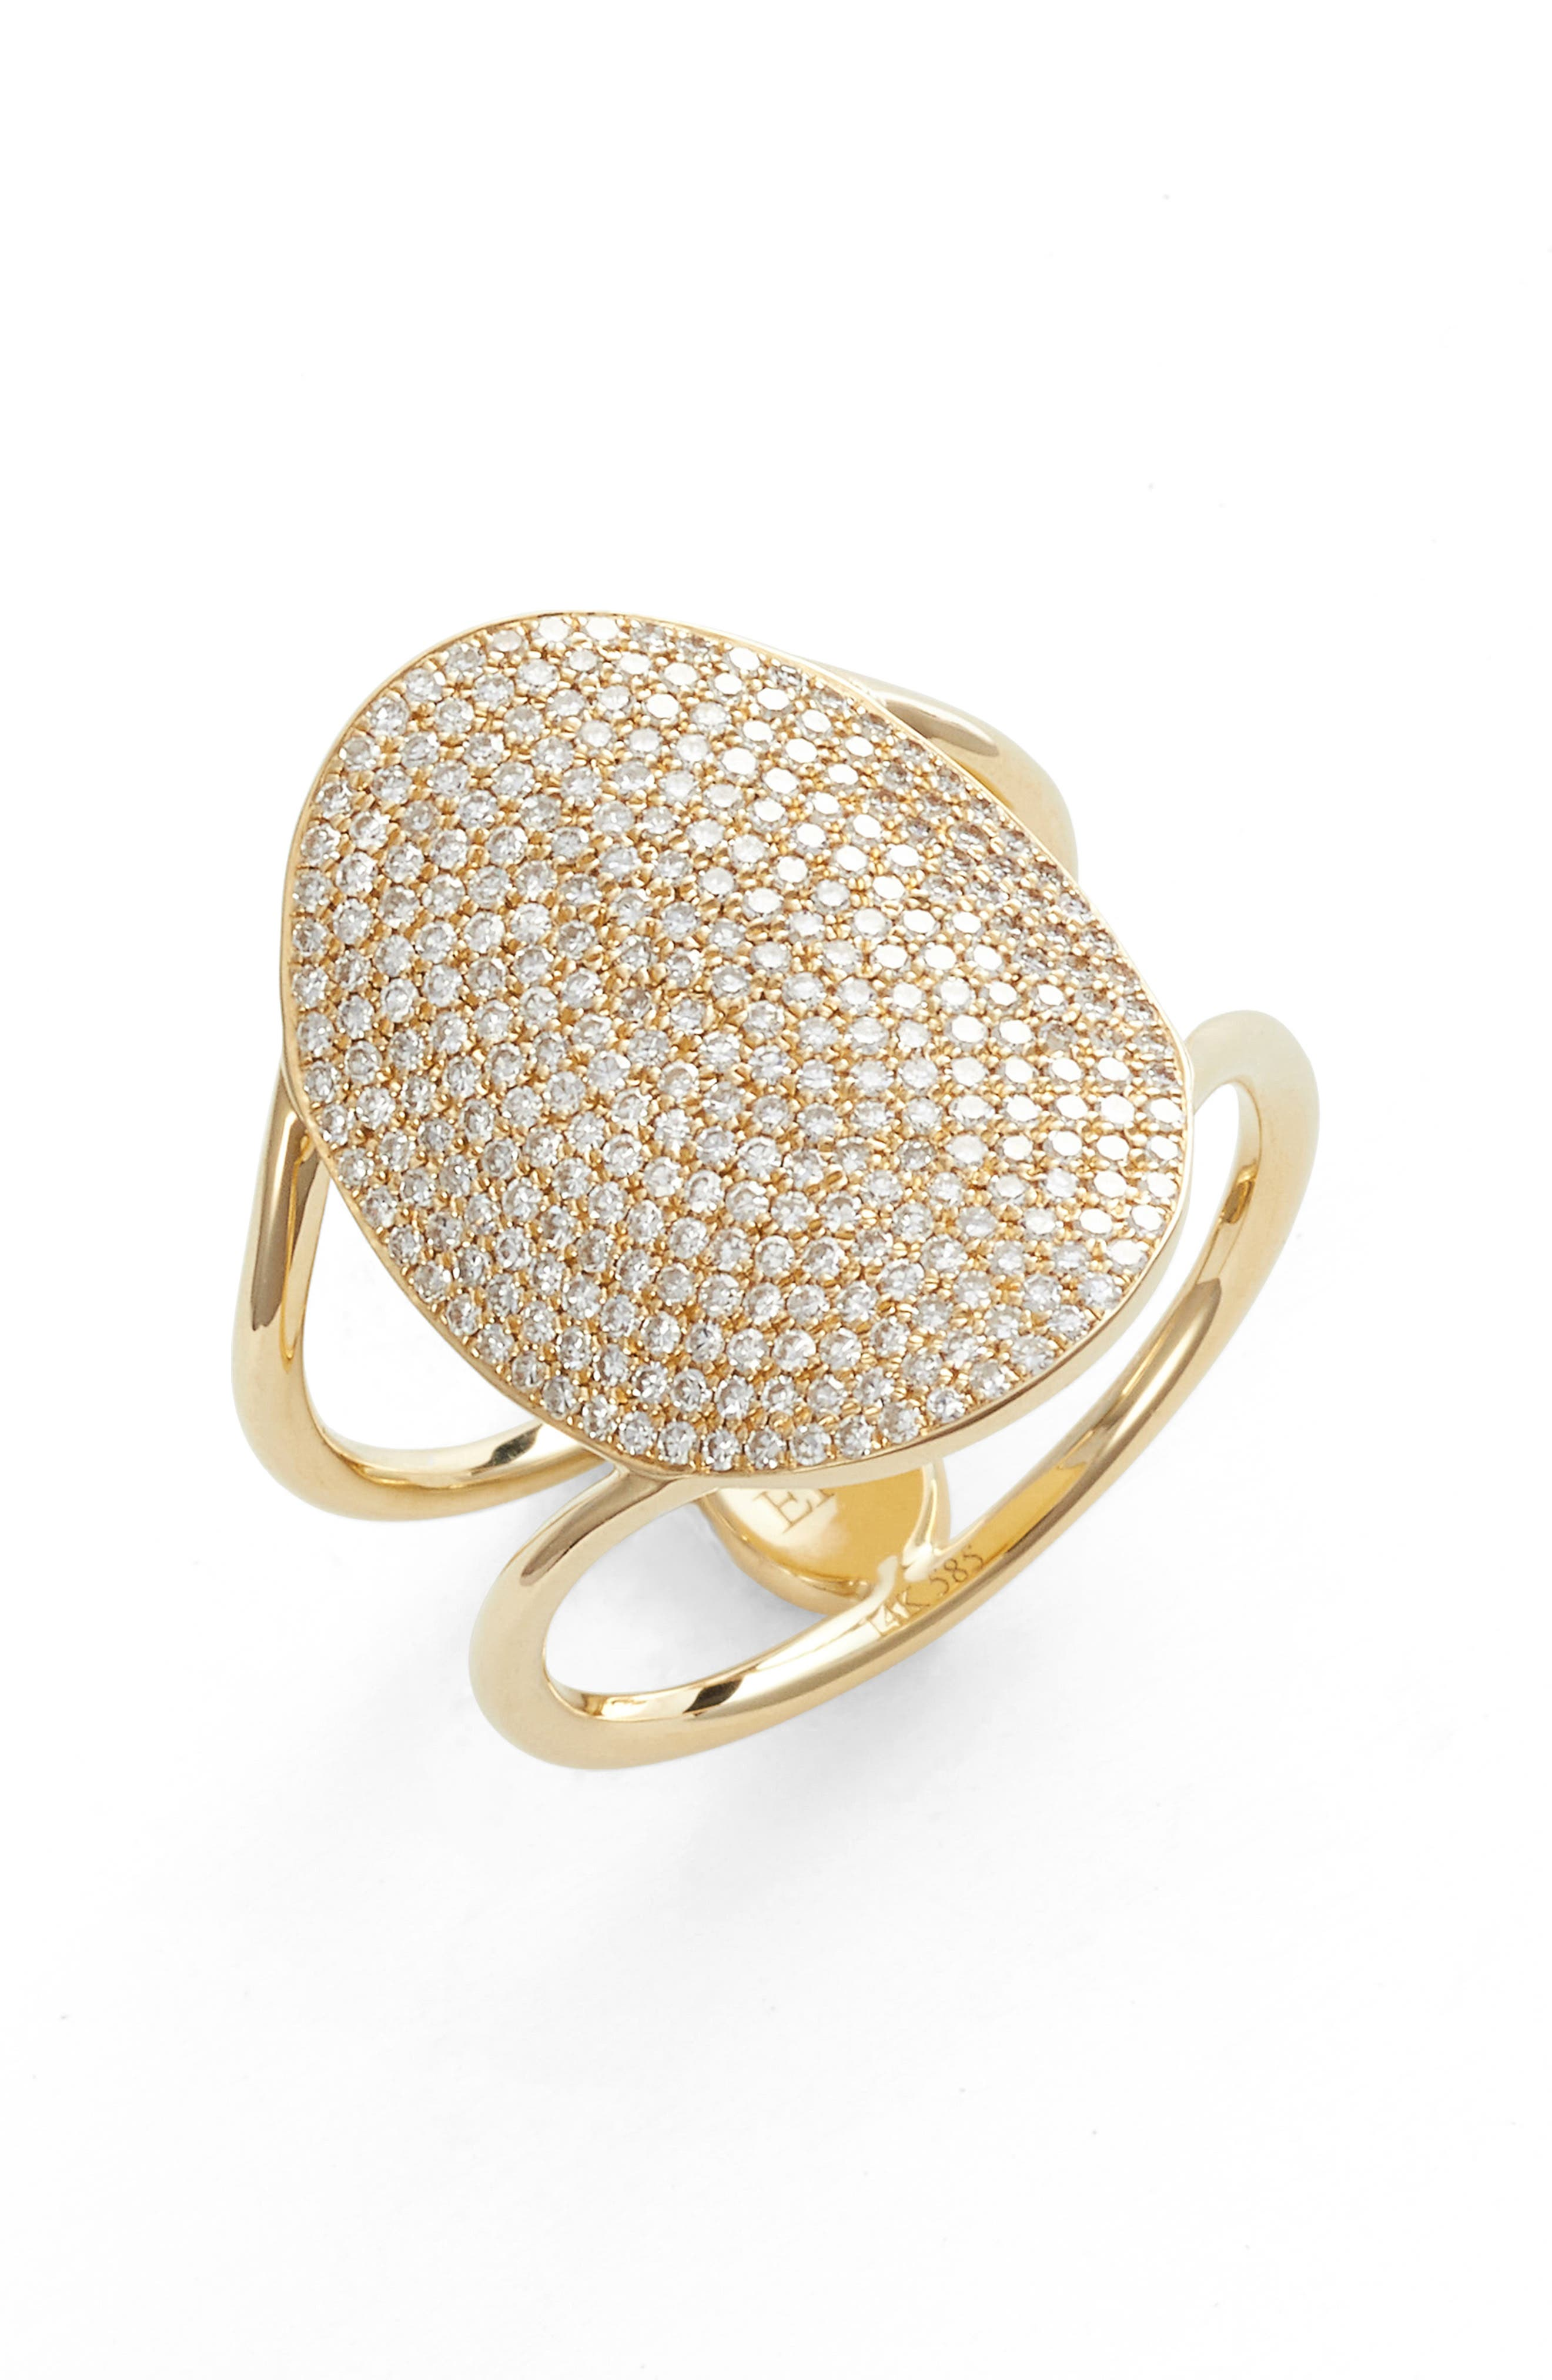 Jumbo Oval Pave Diamond Ring